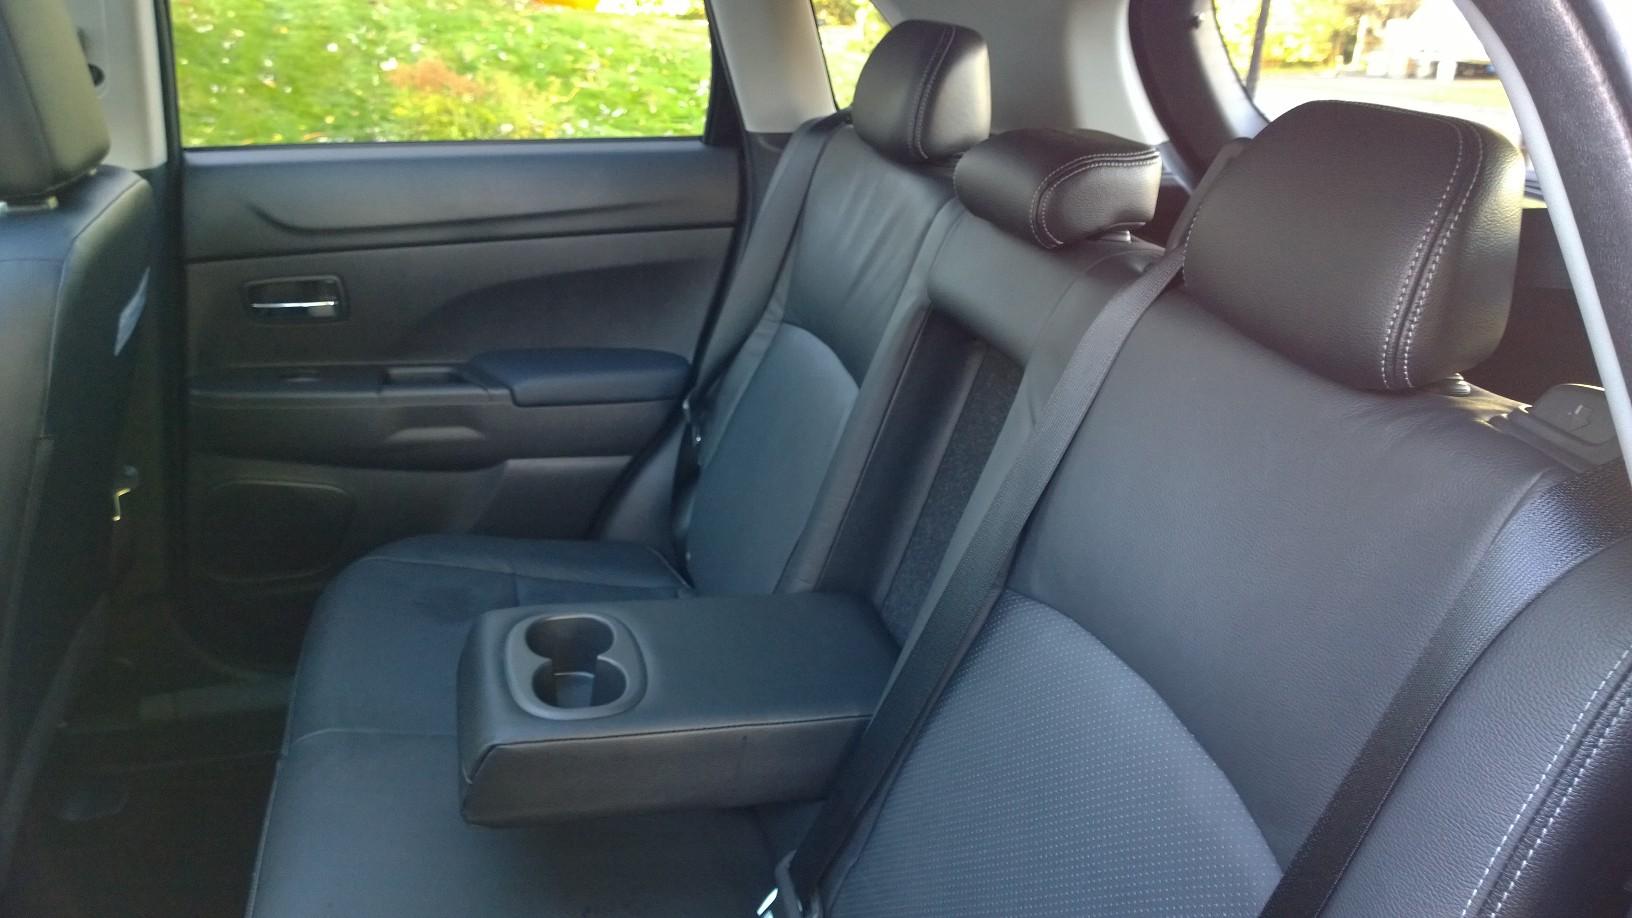 2015 Misubishi Outlander Sport Rear Seats